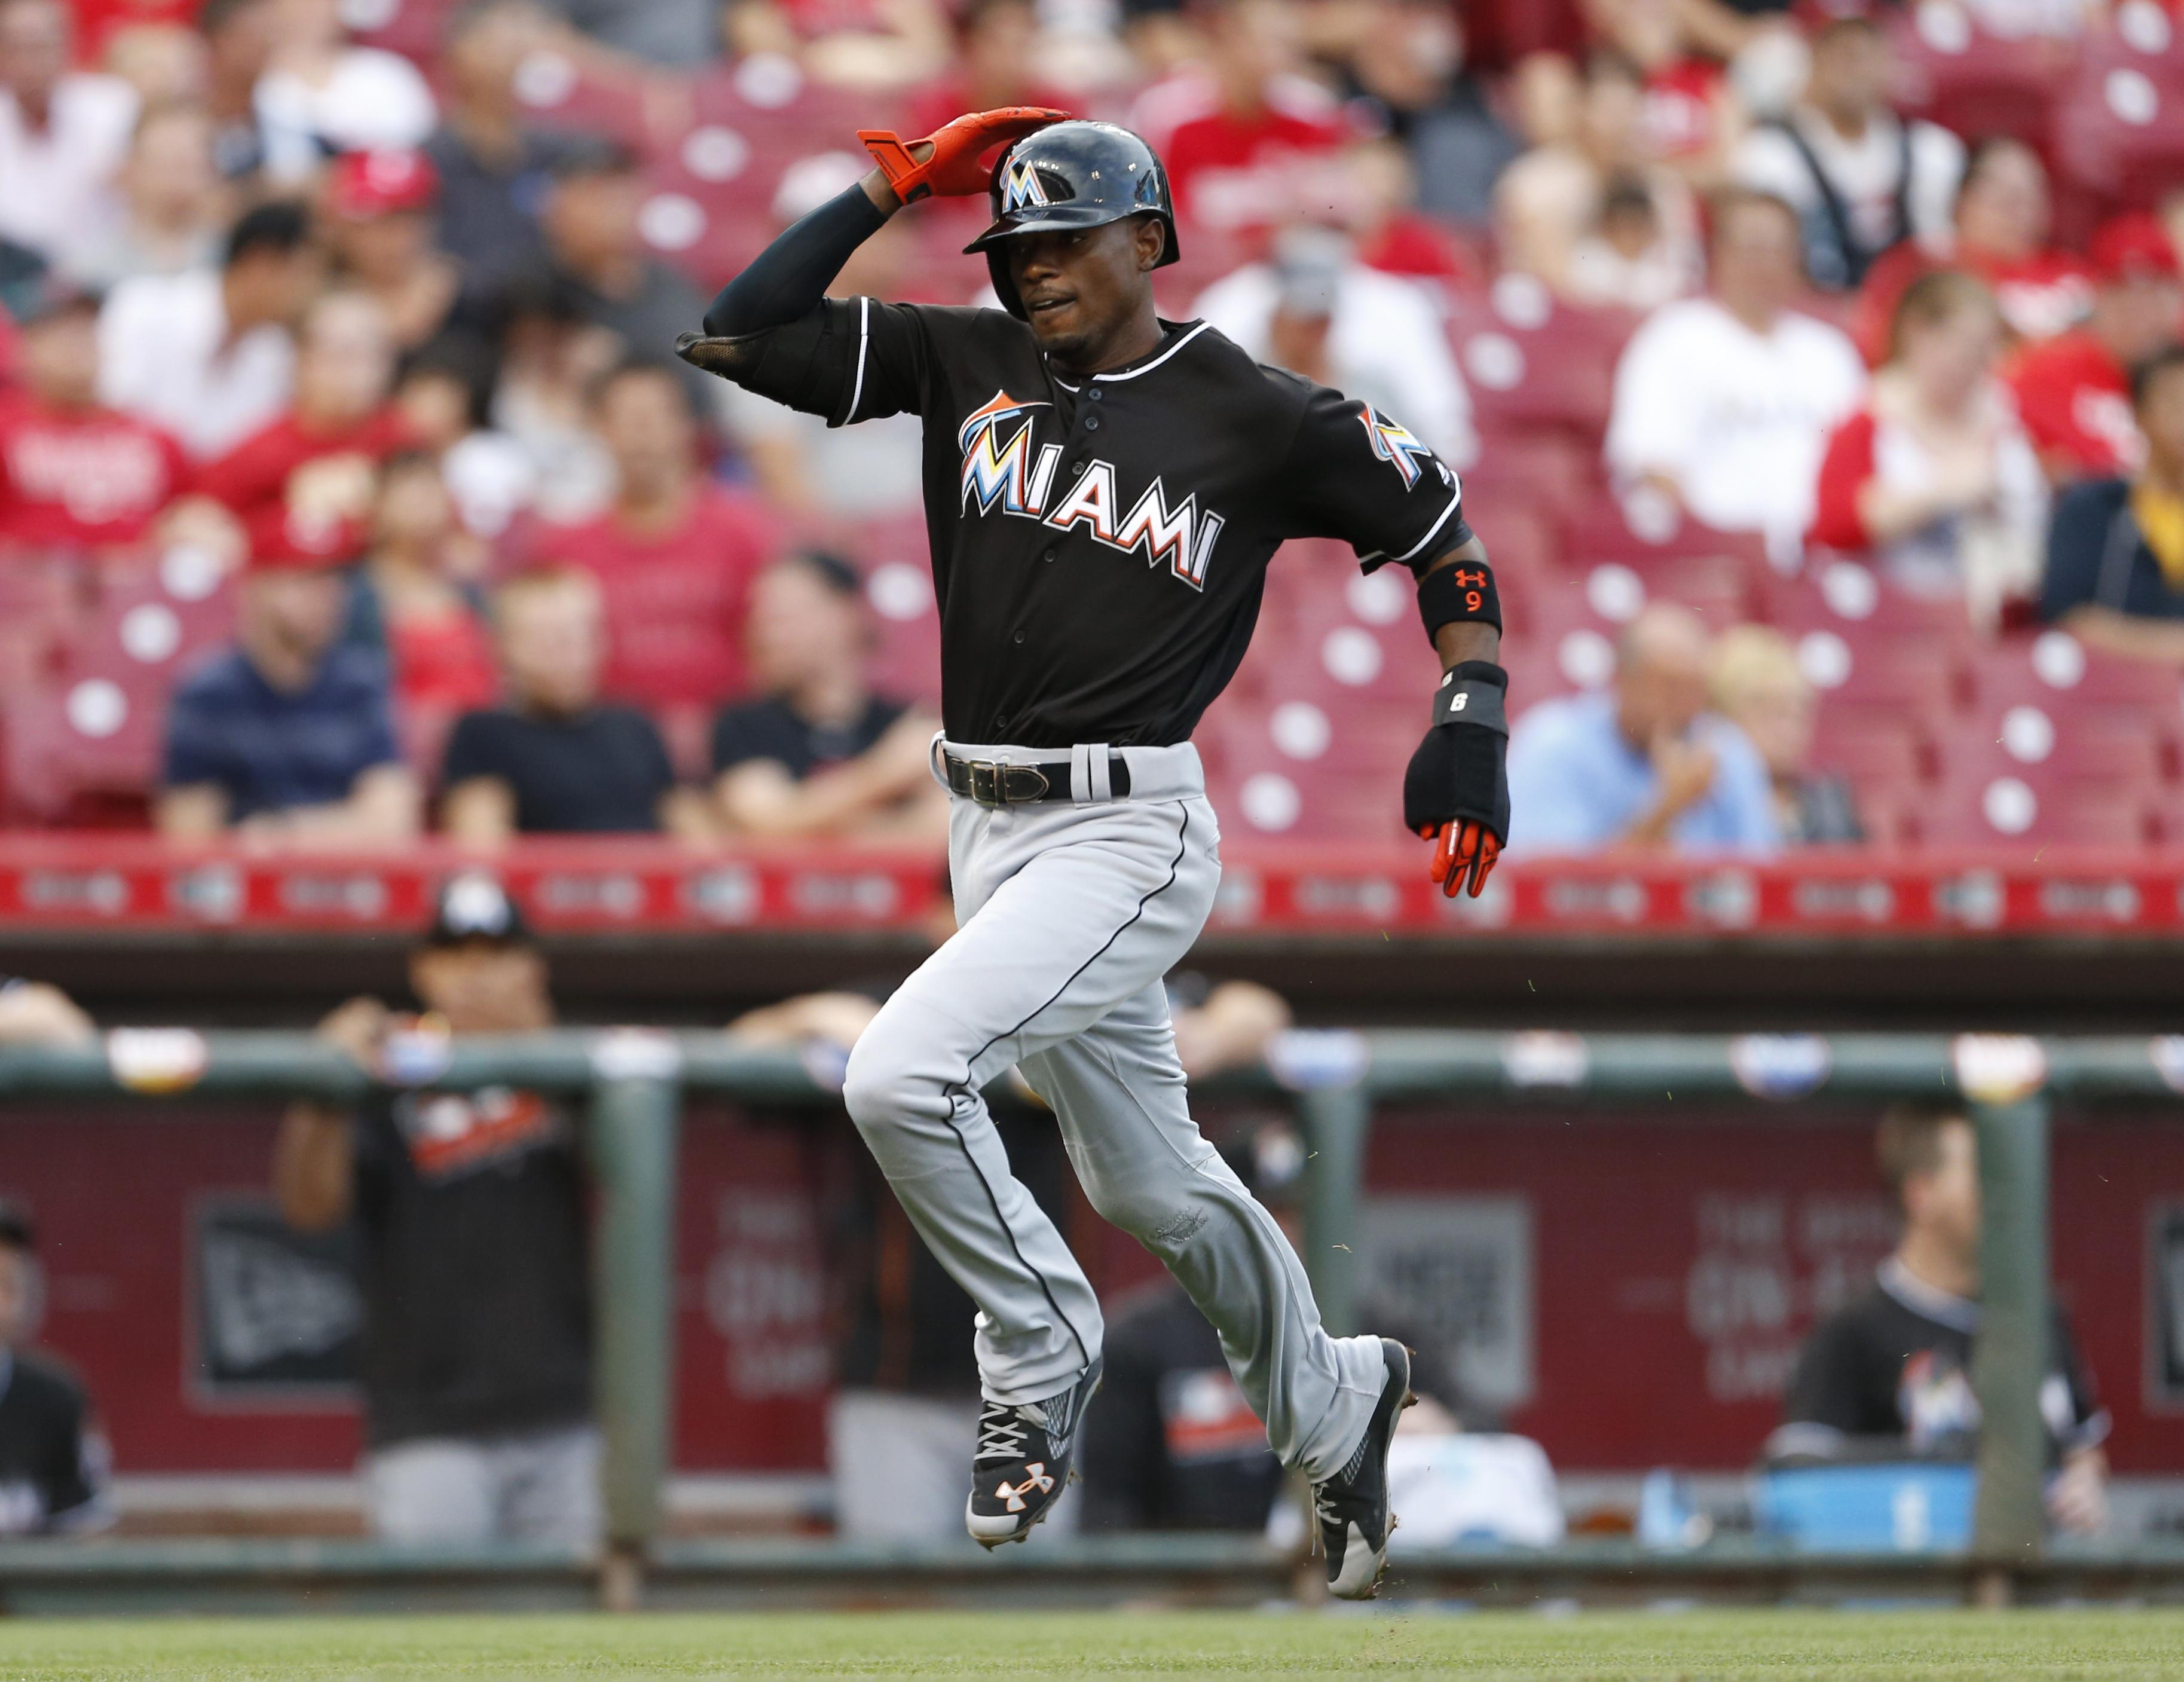 Marlins_reds_baseball